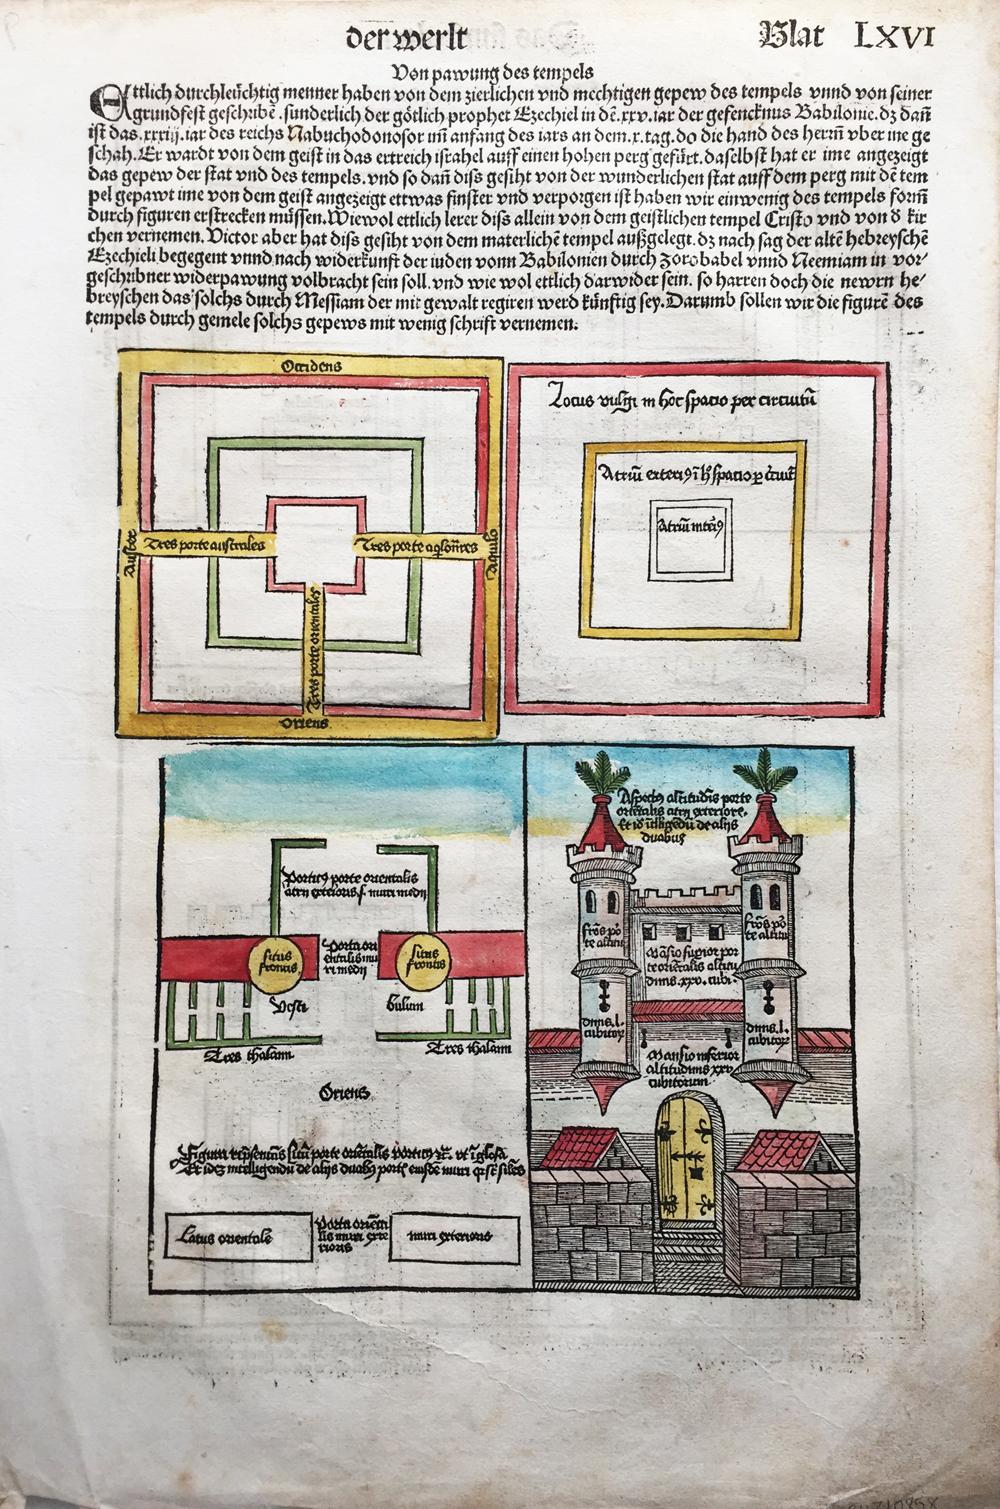 "Nuremberg Chronicle ""Blat LXVI"""